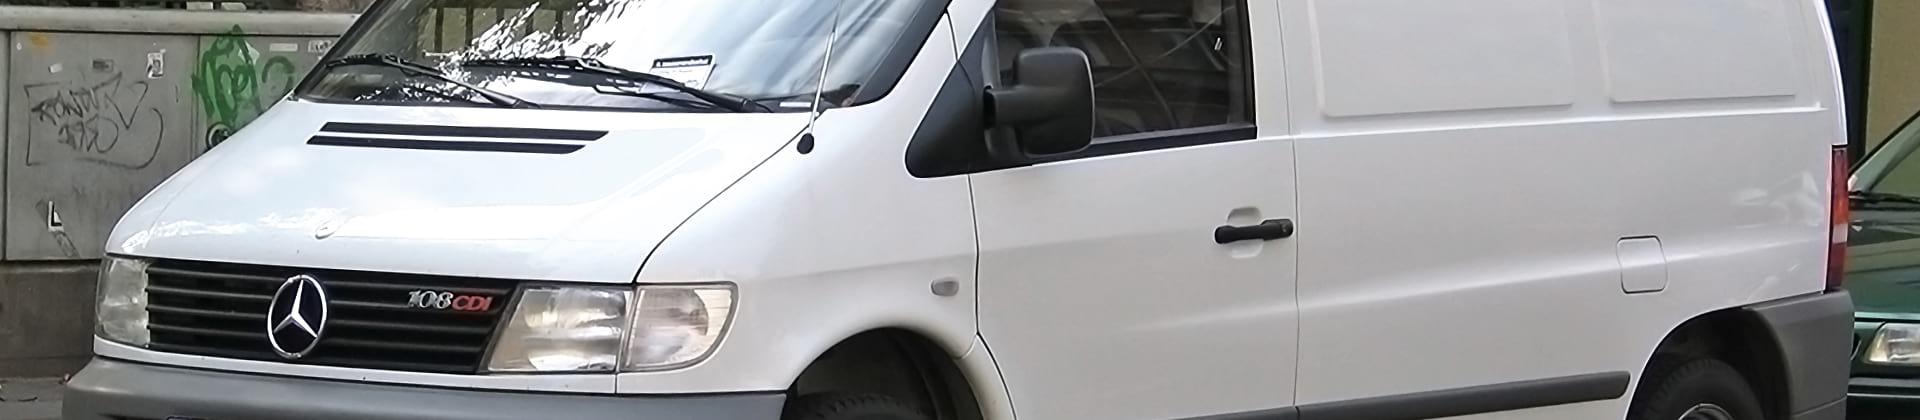 Mercedes-Benz Vito W638 — обшивка фургона